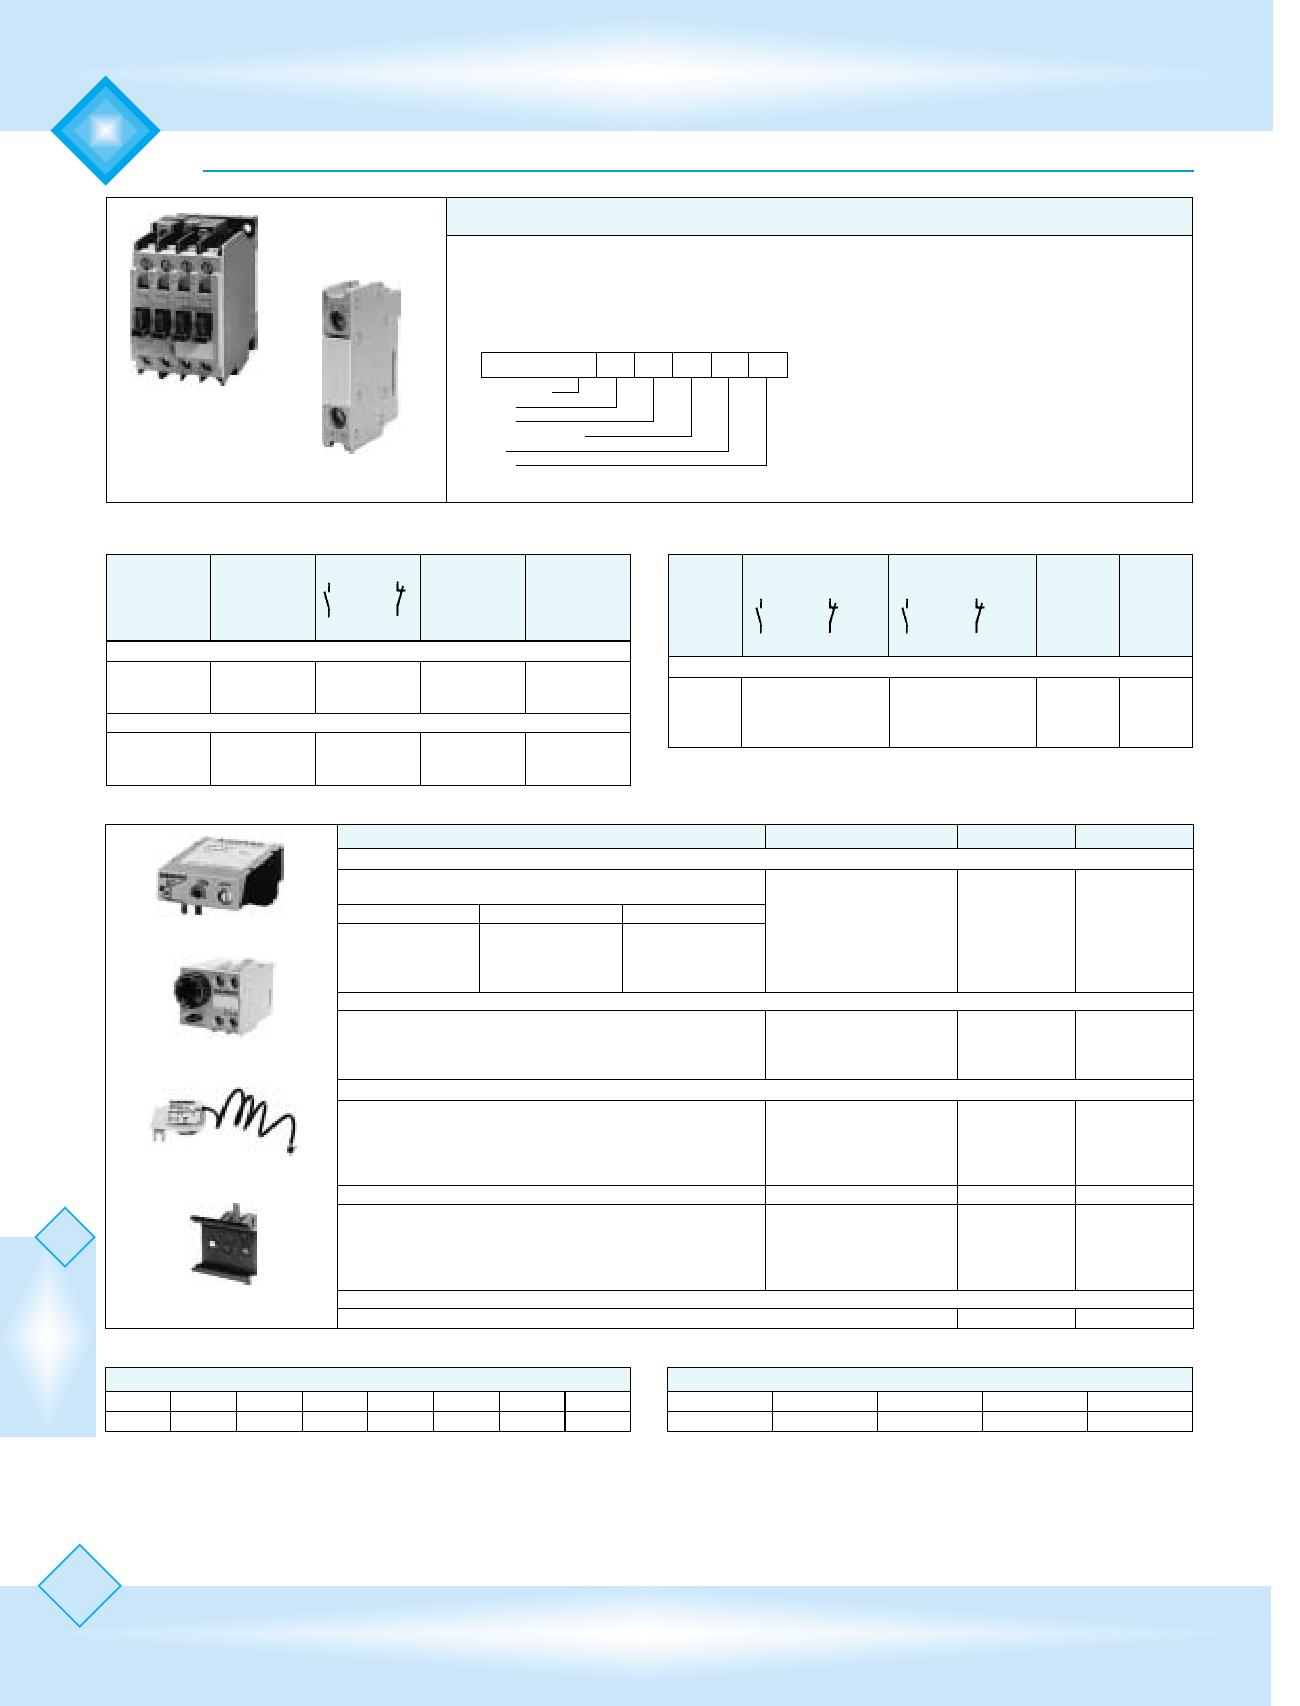 3TH3040-0A Datasheet, 3TH3040-0A PDF,ピン配置, 機能